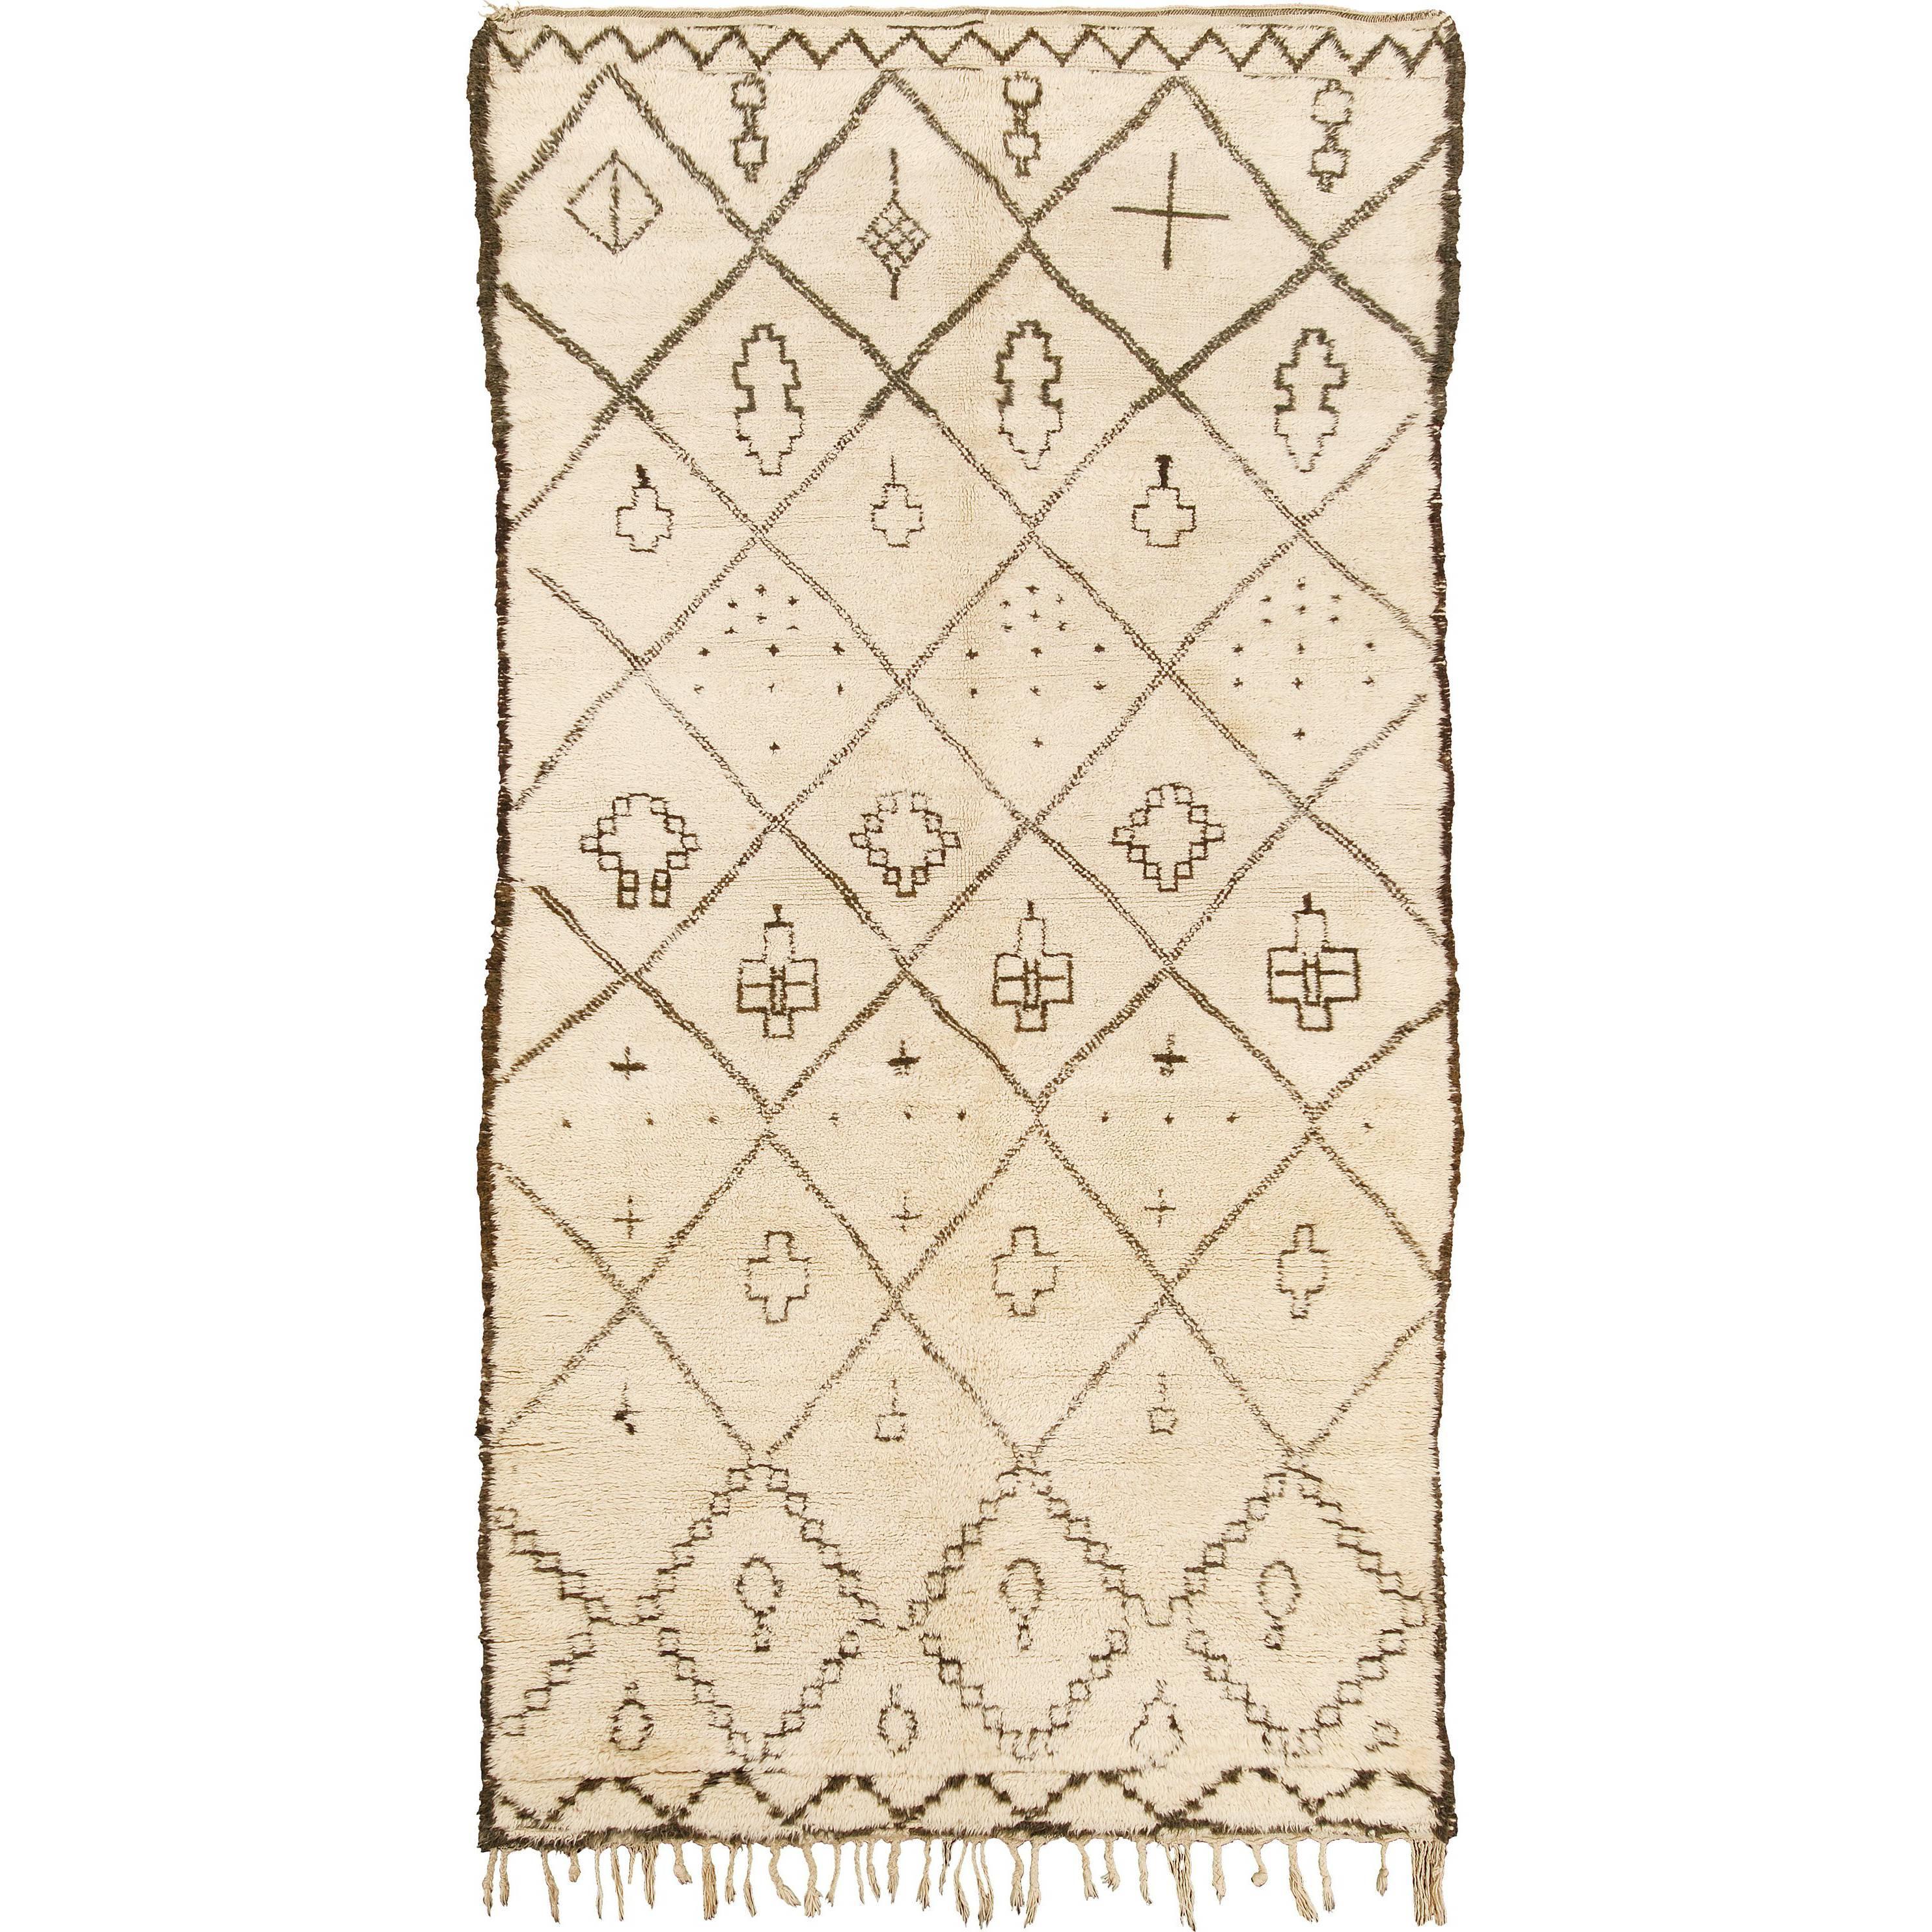 Mid-20th Century Moroccan Beni Ourain Rug